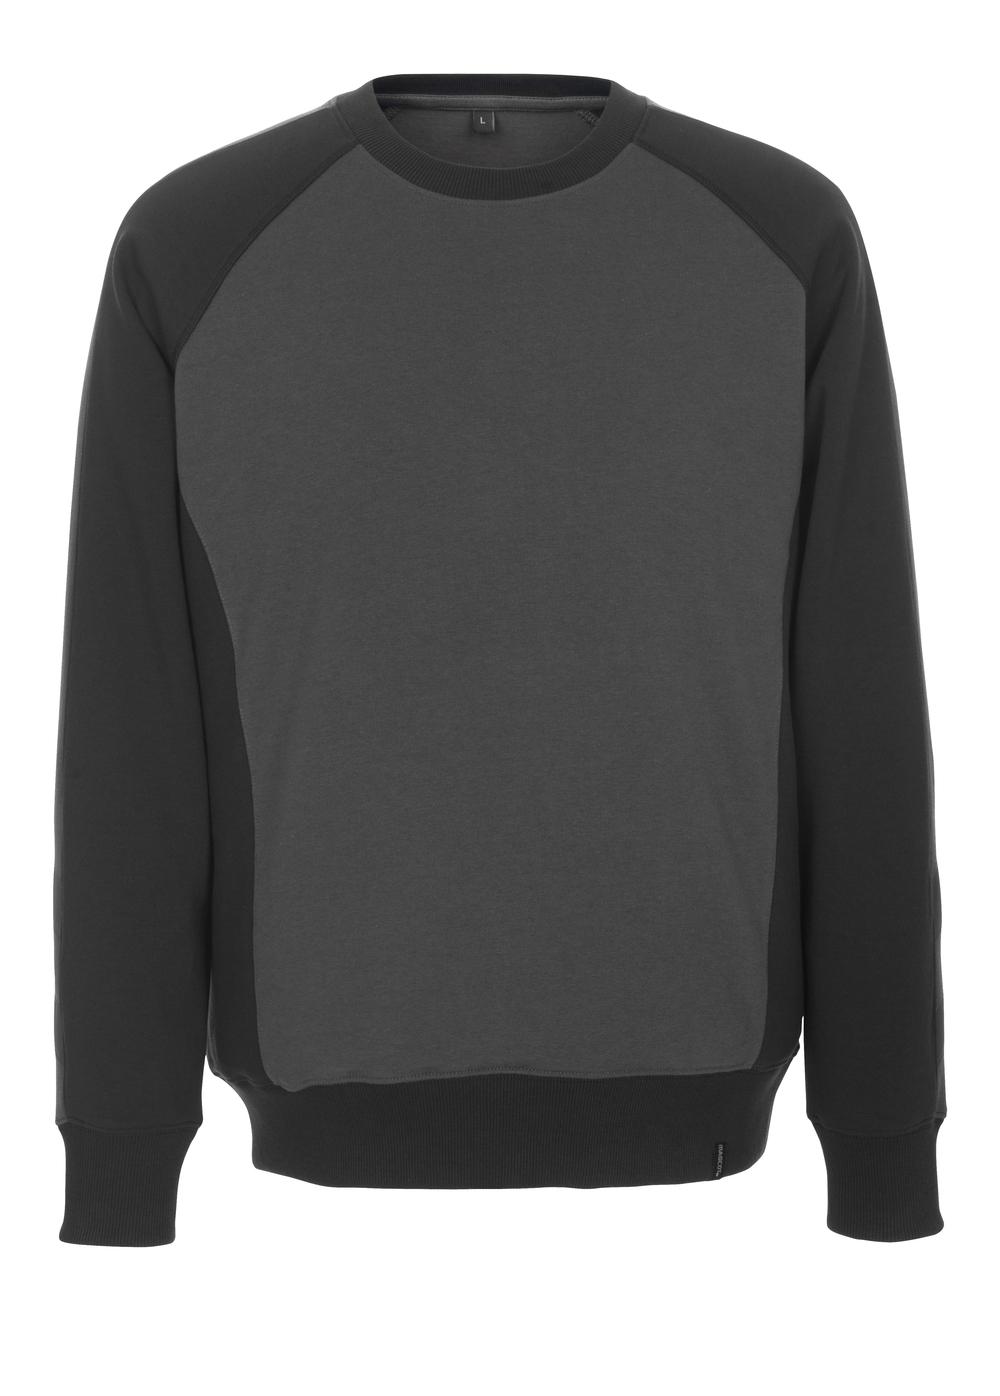 50503-830-1809 Sweatshirt - mörk antracit/svart